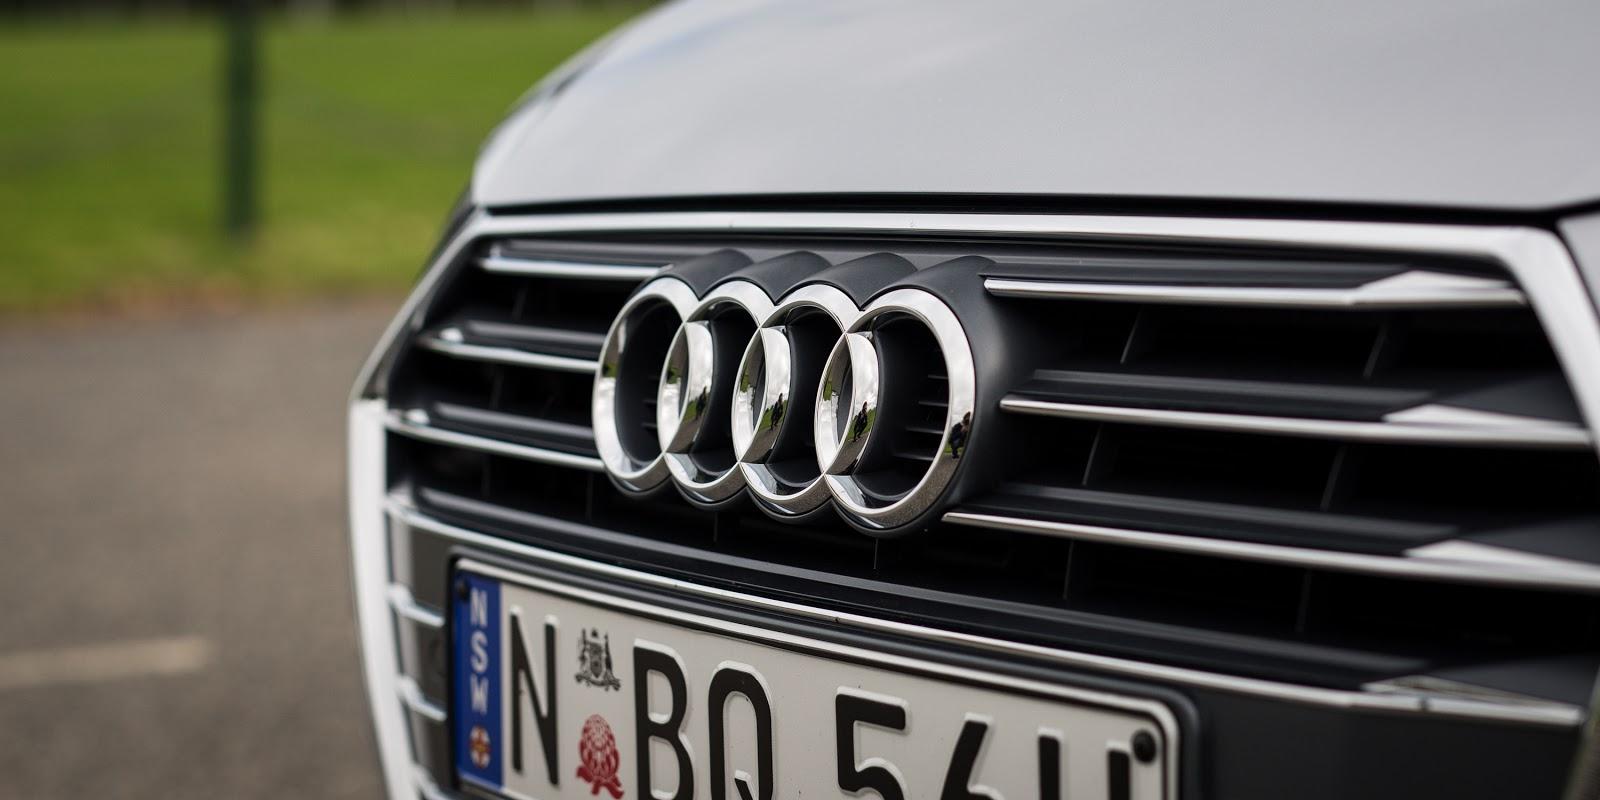 Đánh giá xe Audi A4 2016